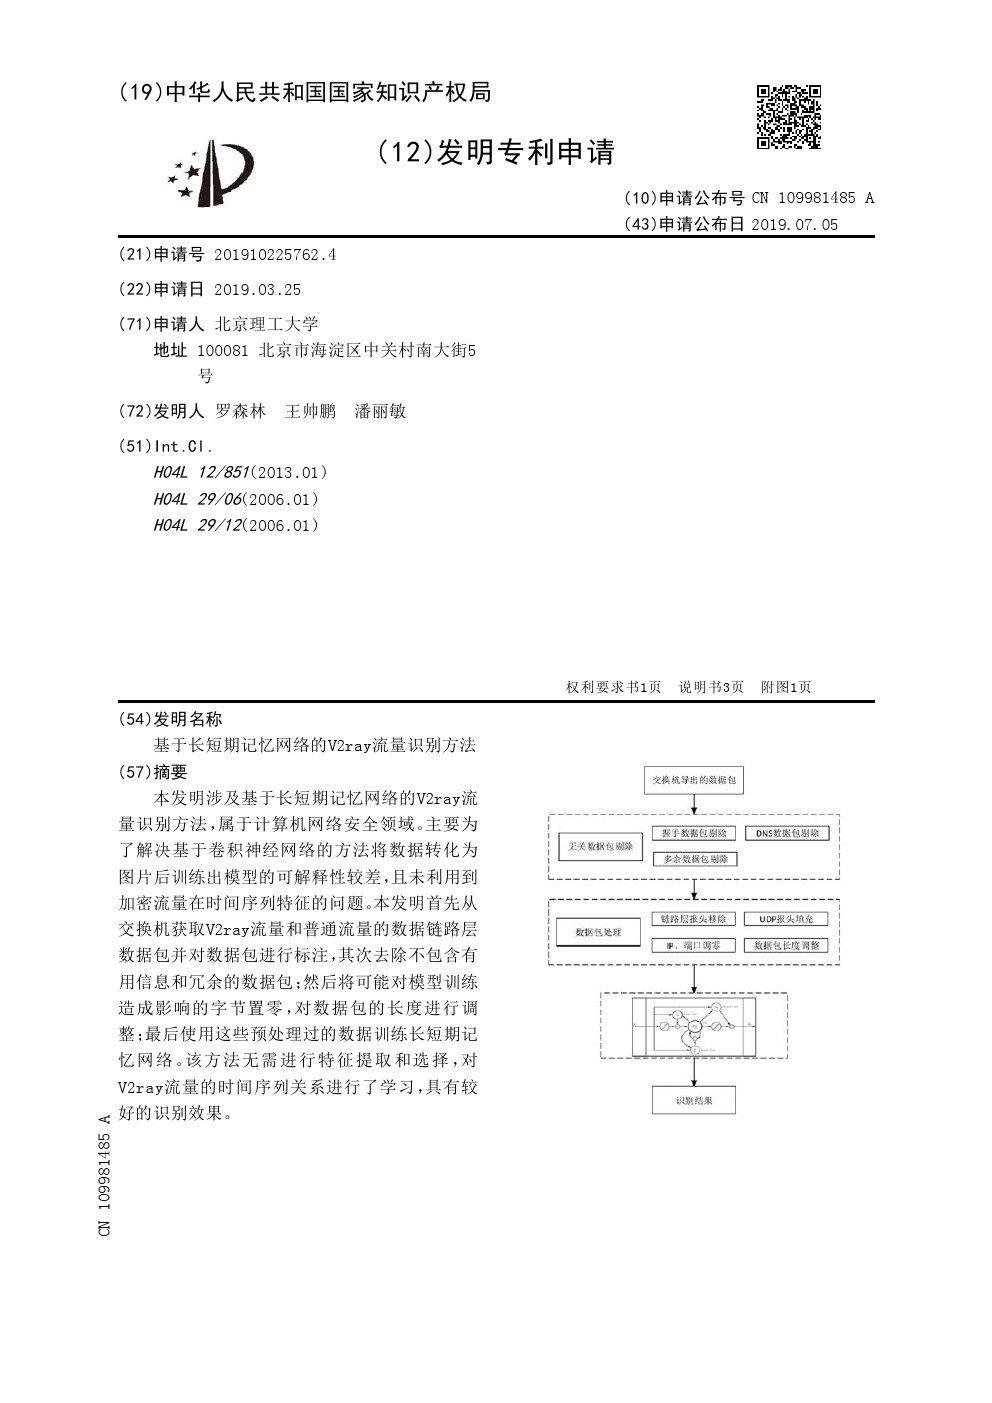 V2ray流量识别方法专利-1